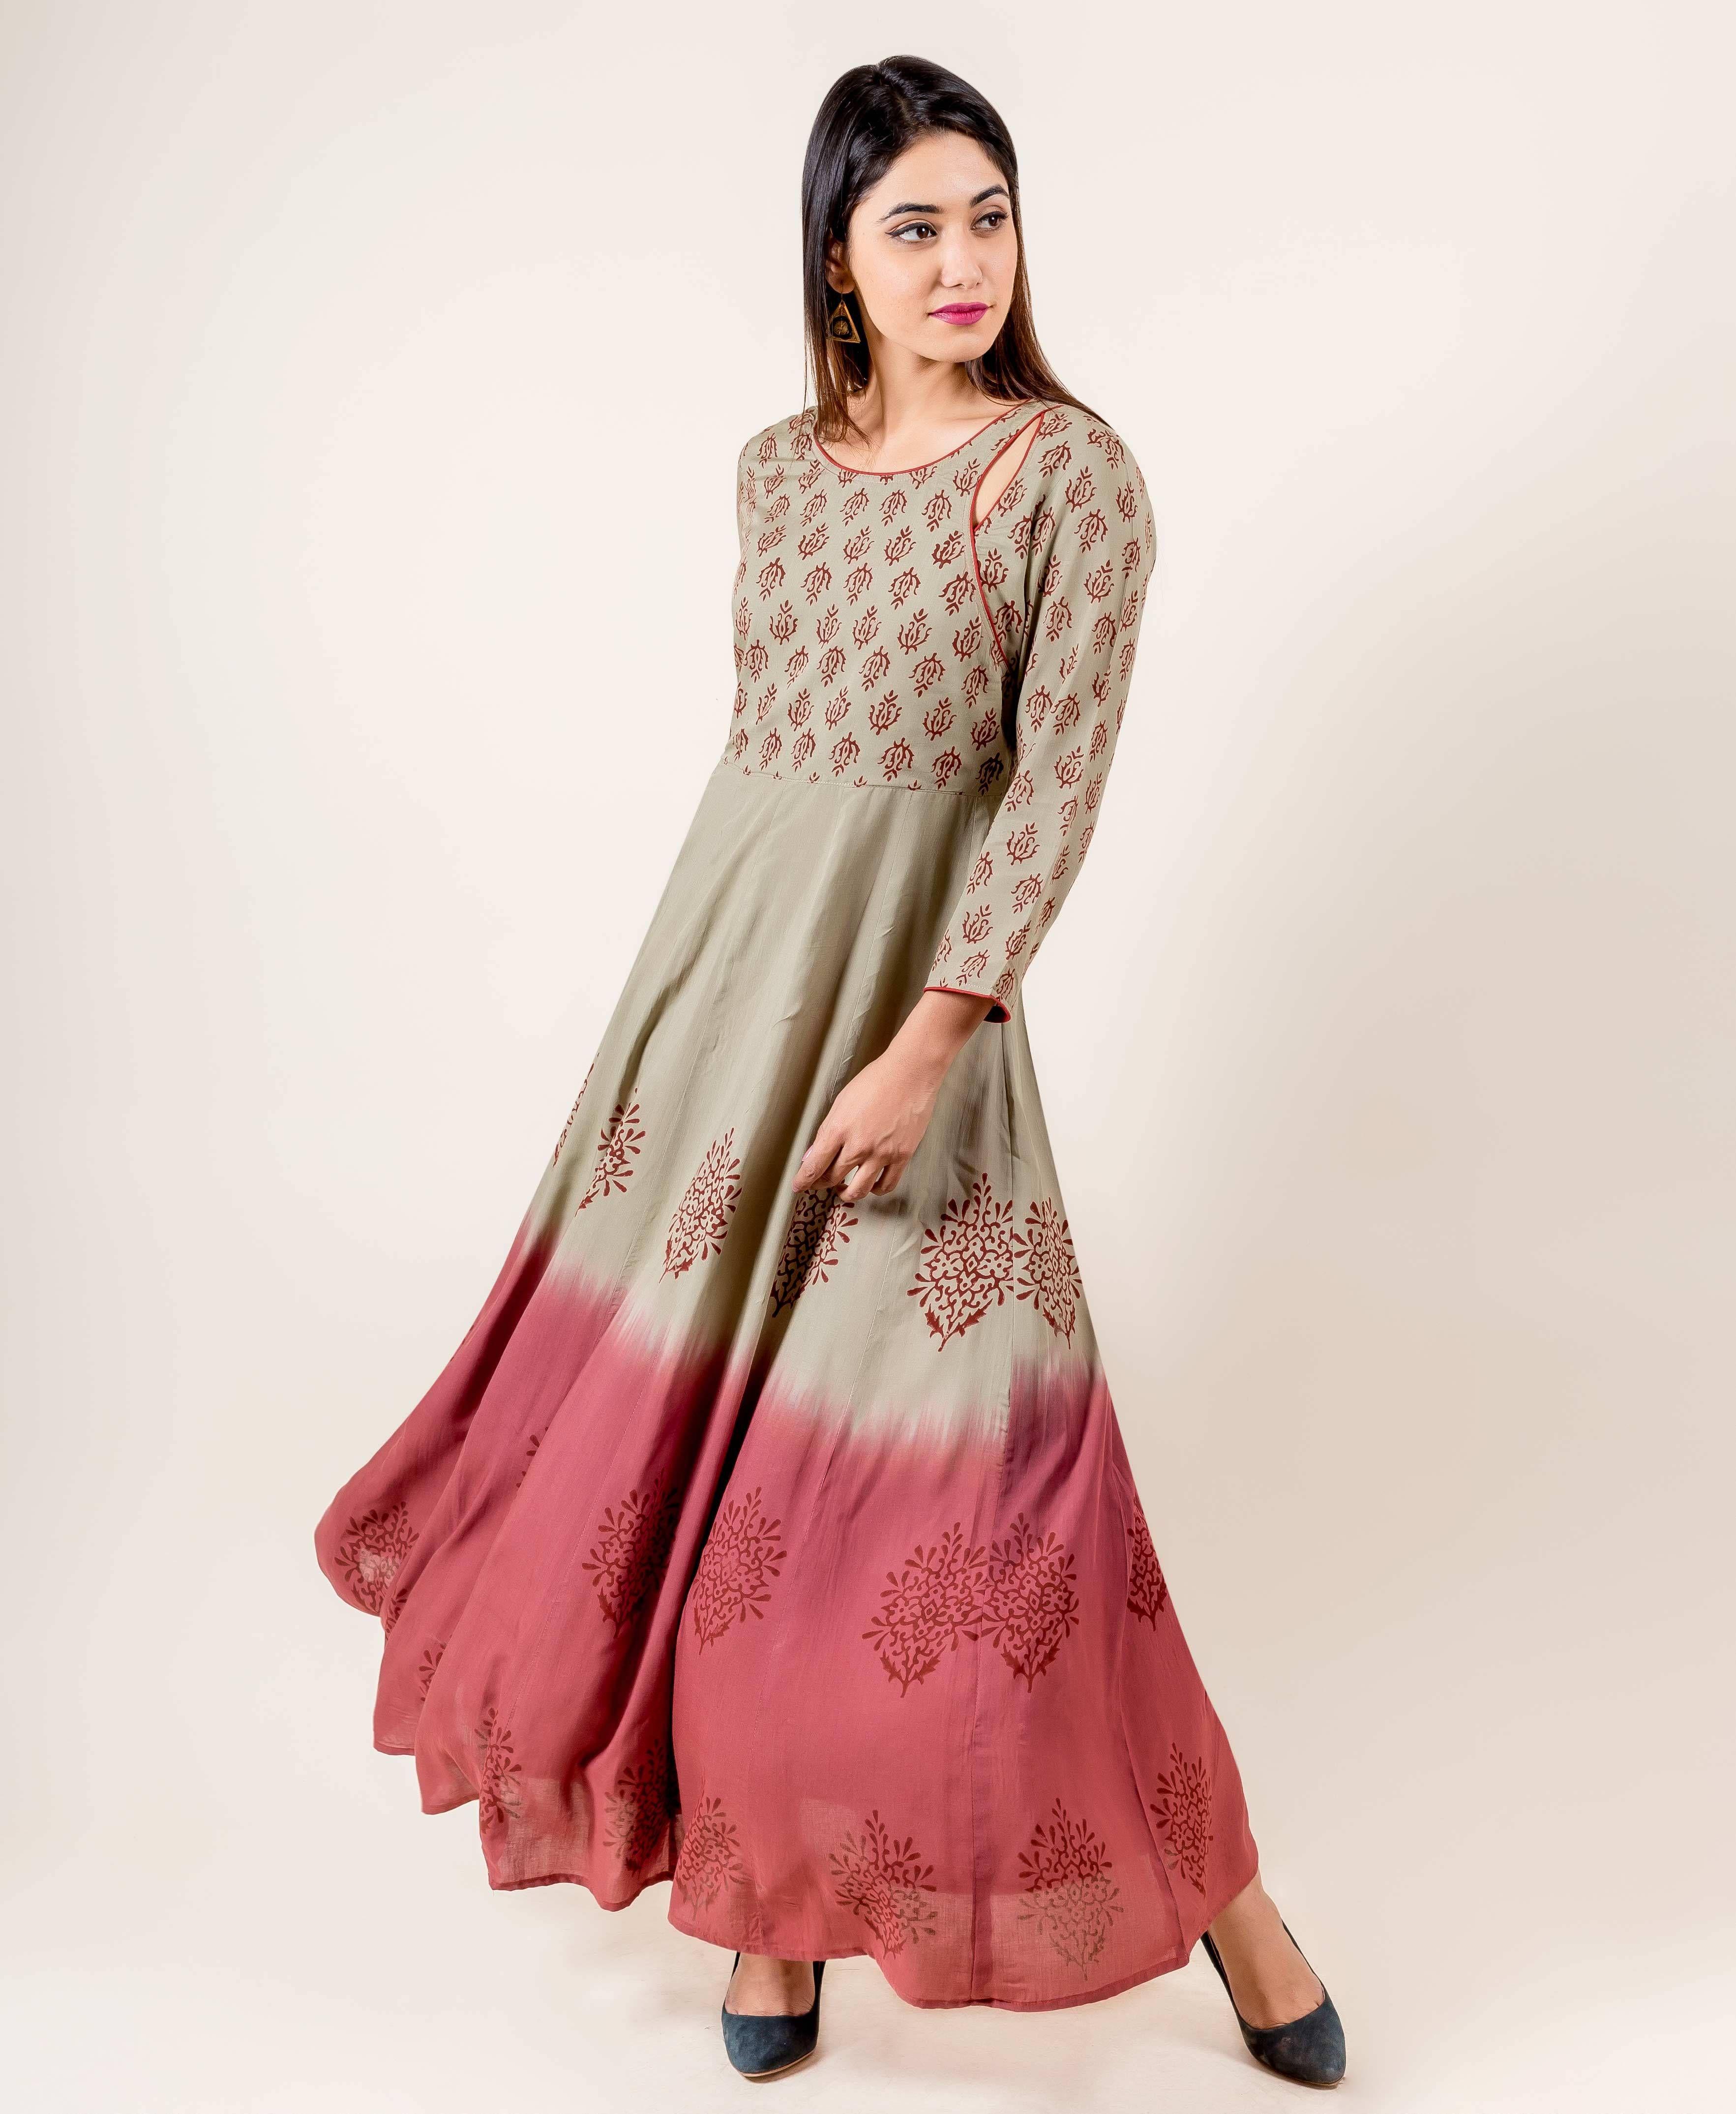 622401c8ceb Splendid Hand Block Printed Indowestern Outfit in 2019